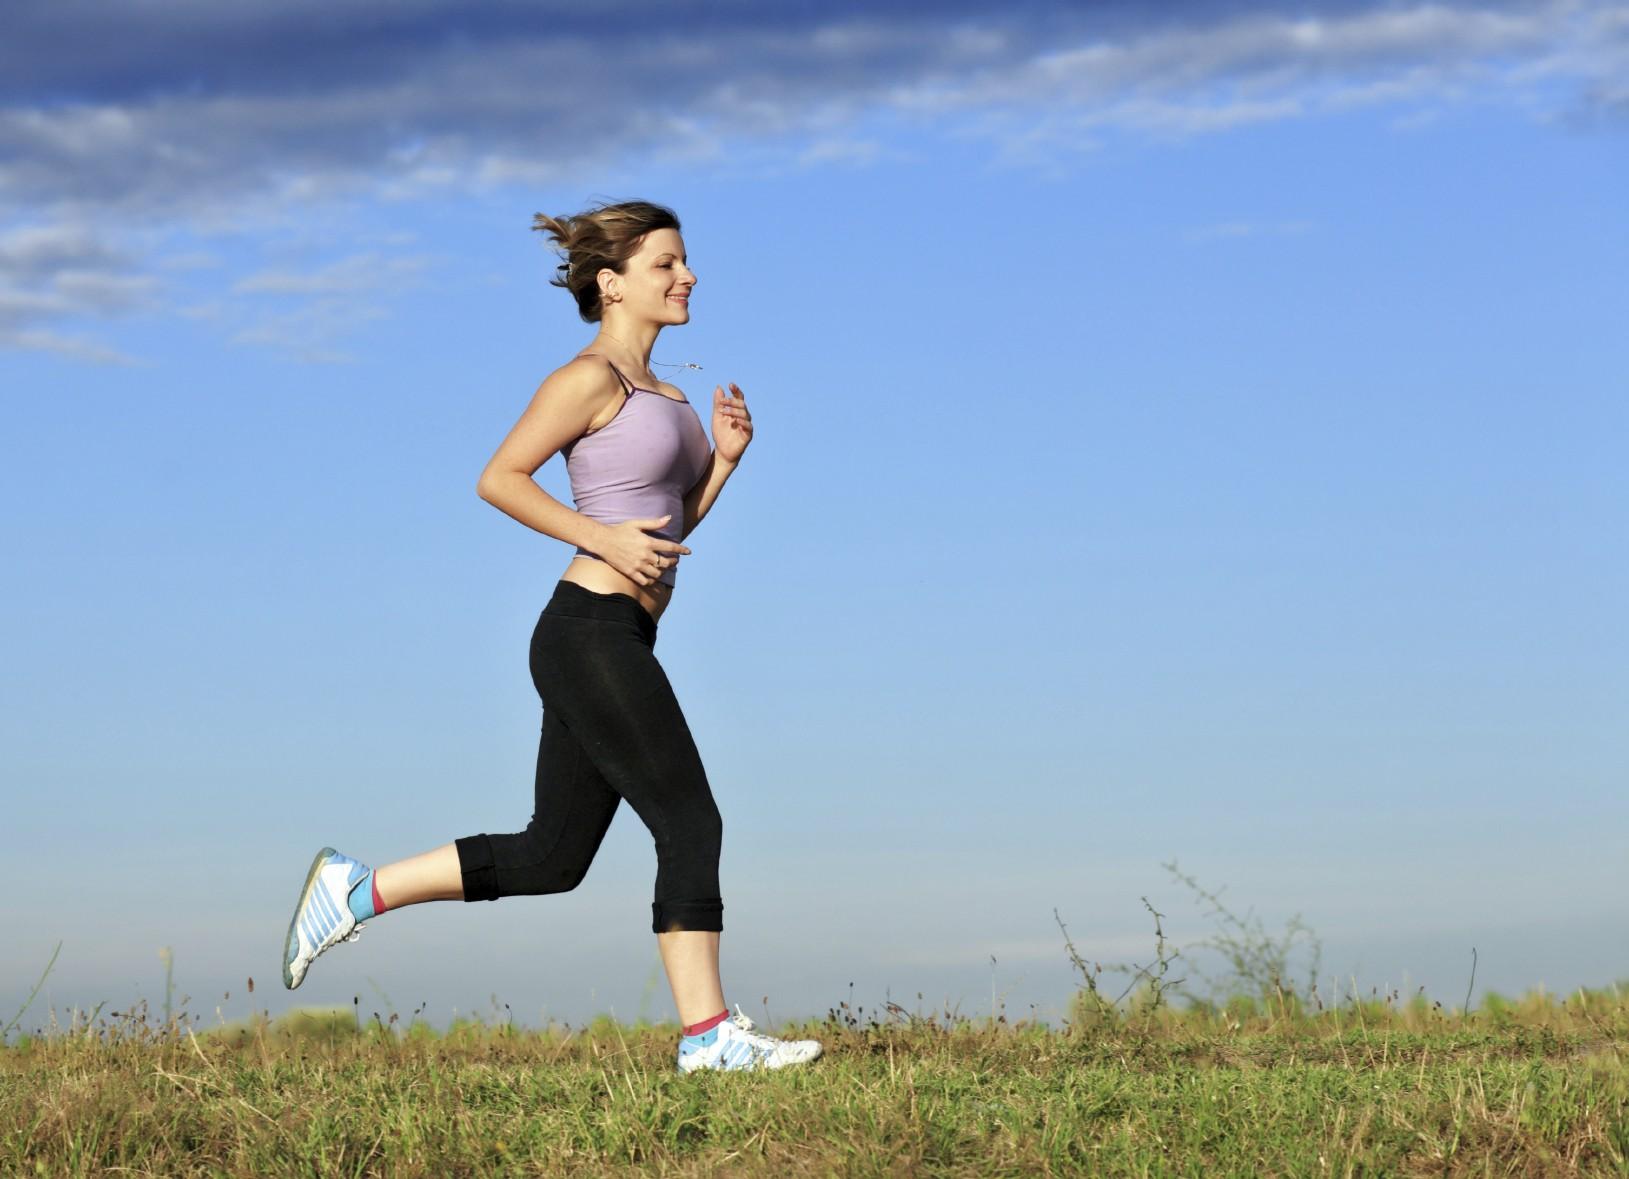 magas vérnyomás sportolhat a magas vérnyomás kapcsolata a gerincvel